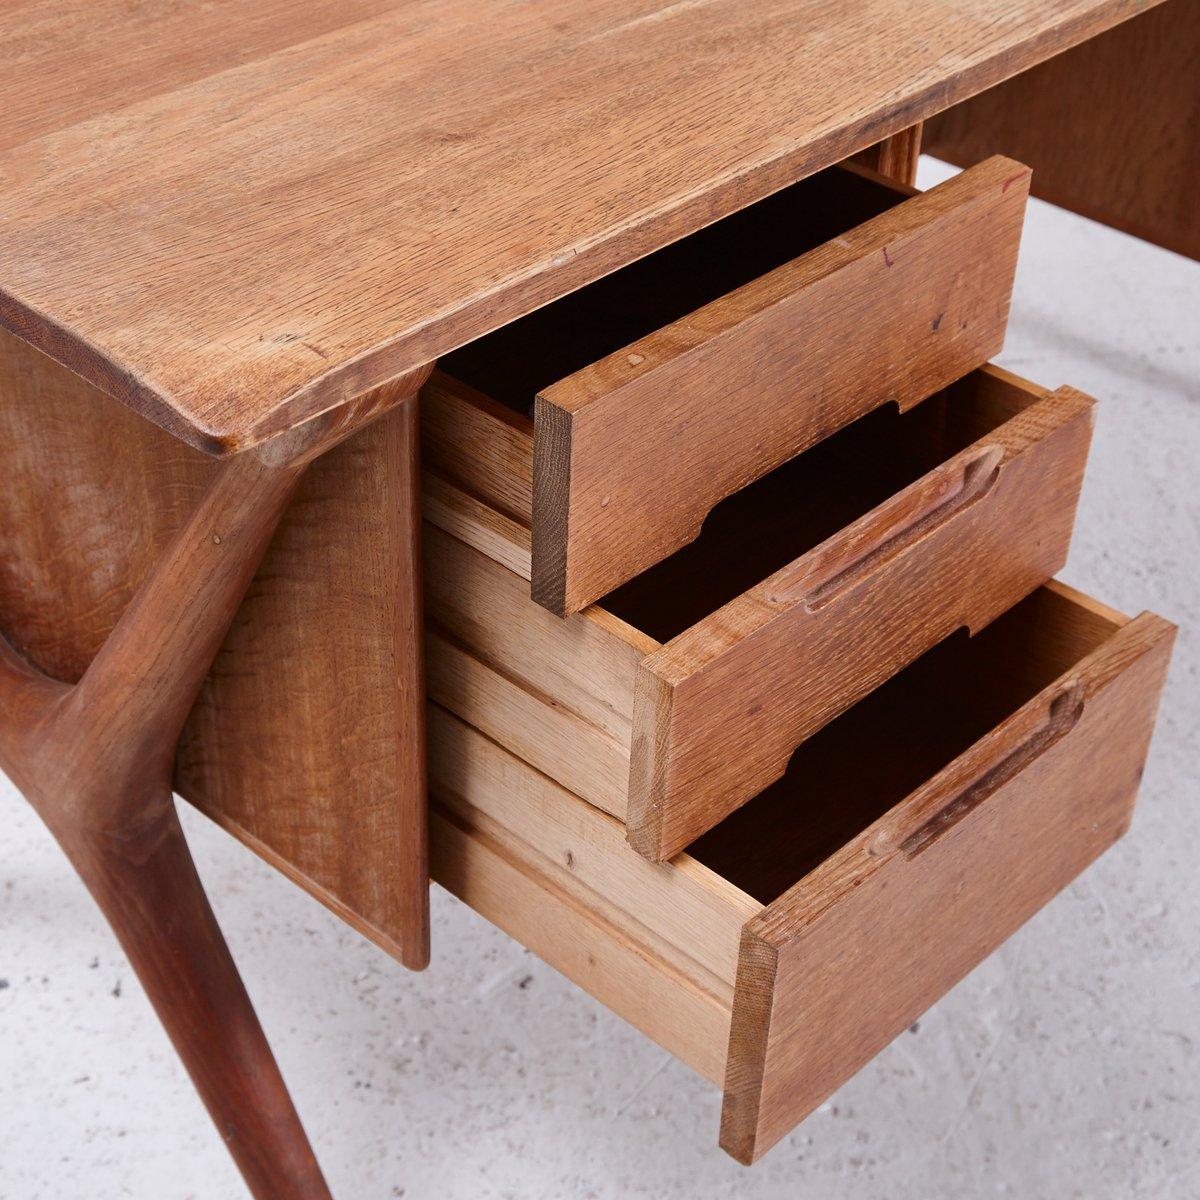 Oak Desk With Drawers ~ Vintage six drawer oak desk s for sale at pamono